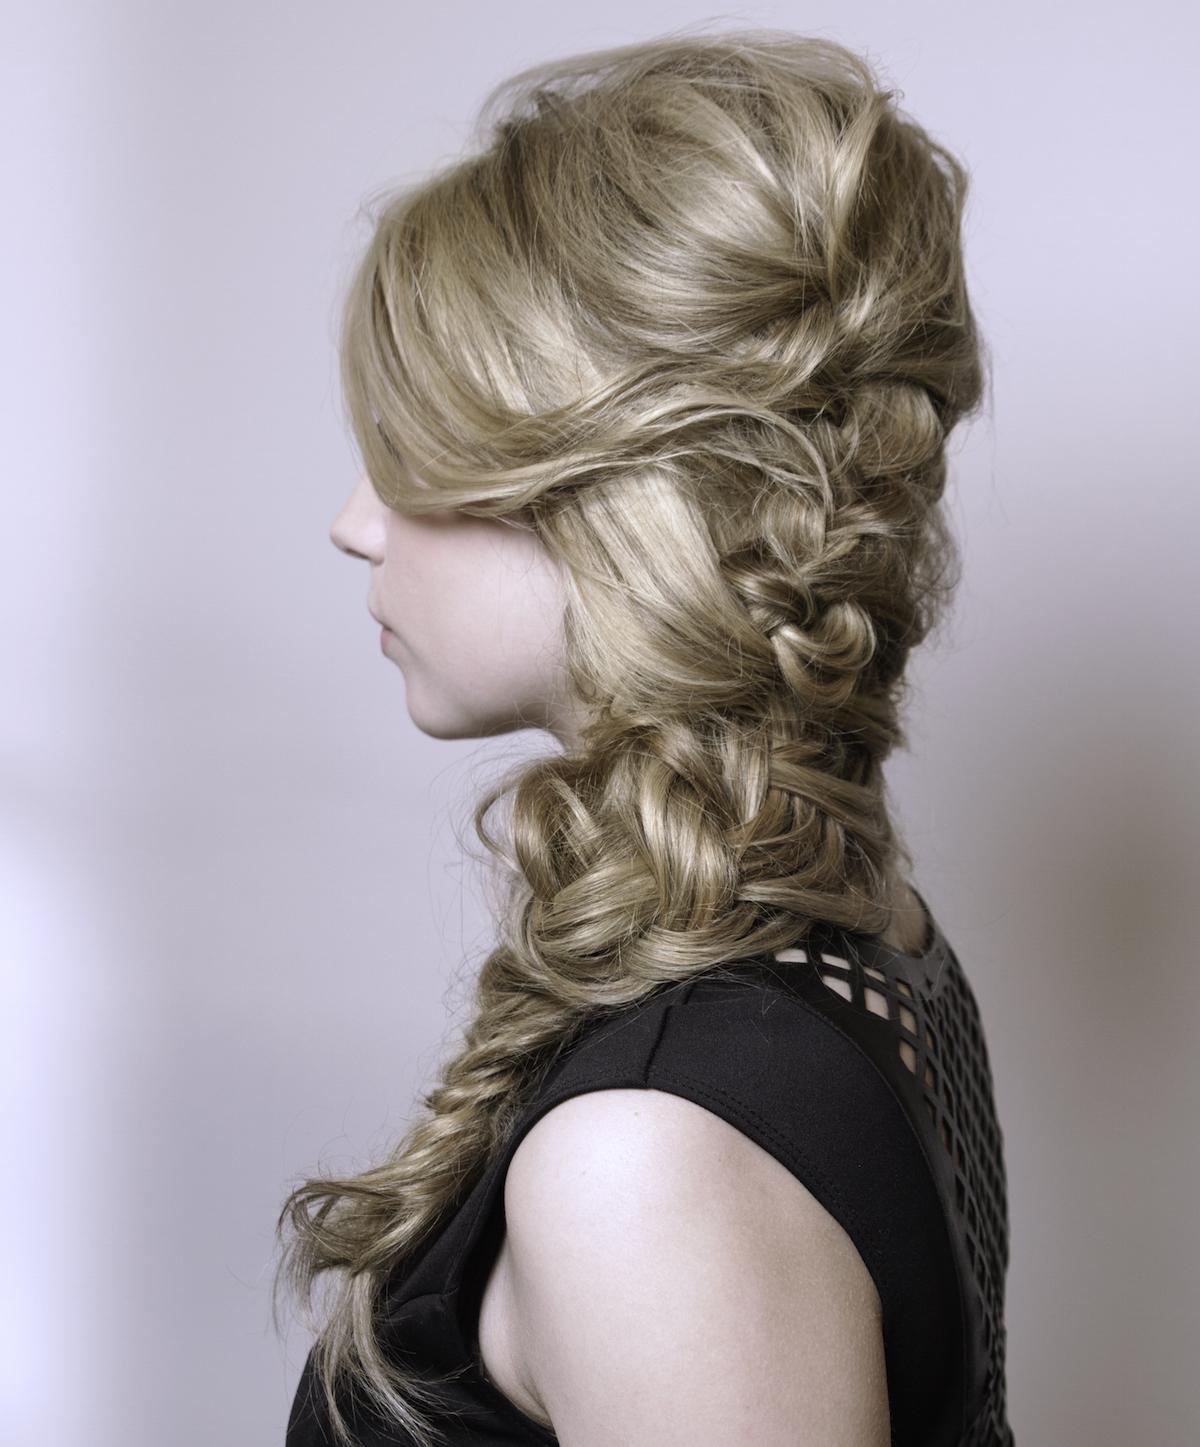 Style by Eva Mustafai/Photo courtesy of Salon Eva Michelle